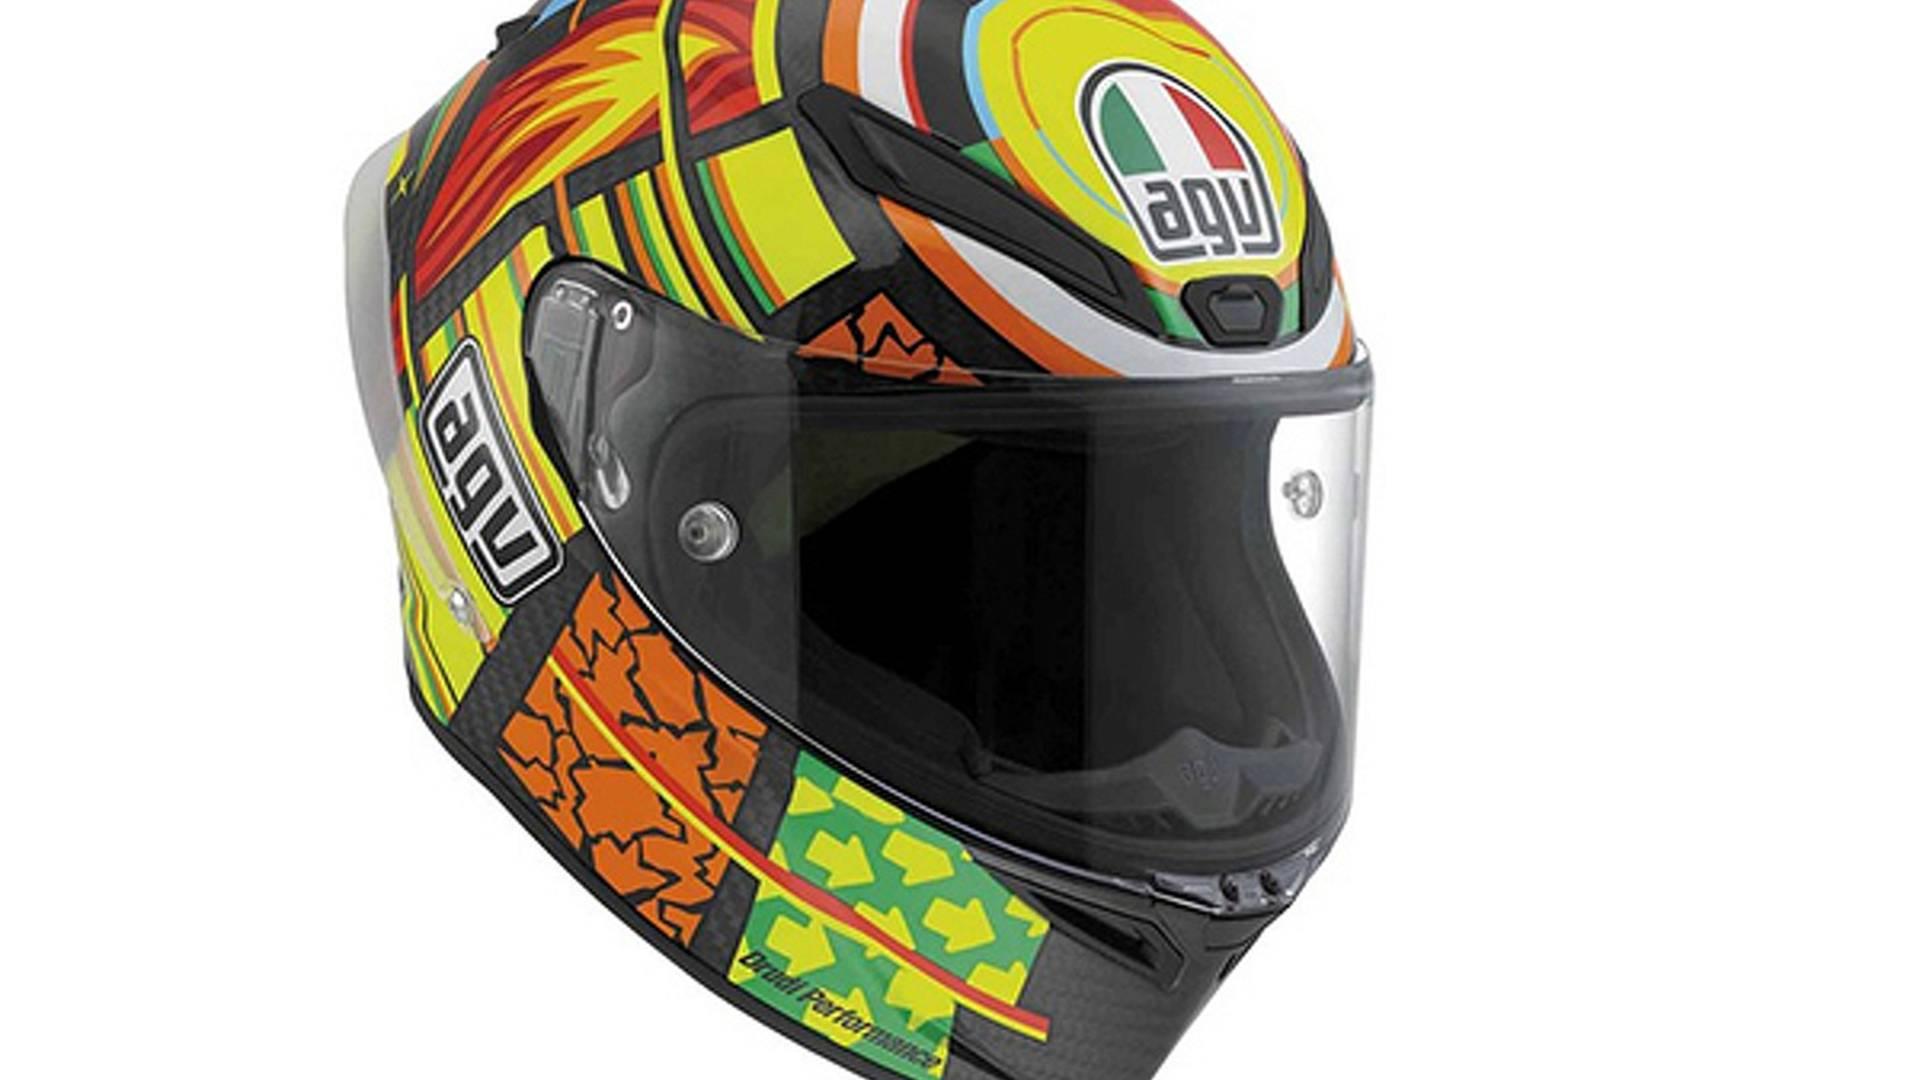 AGV Pista GP Rossi Replica The Most Advanced Ugly Helmet Ever